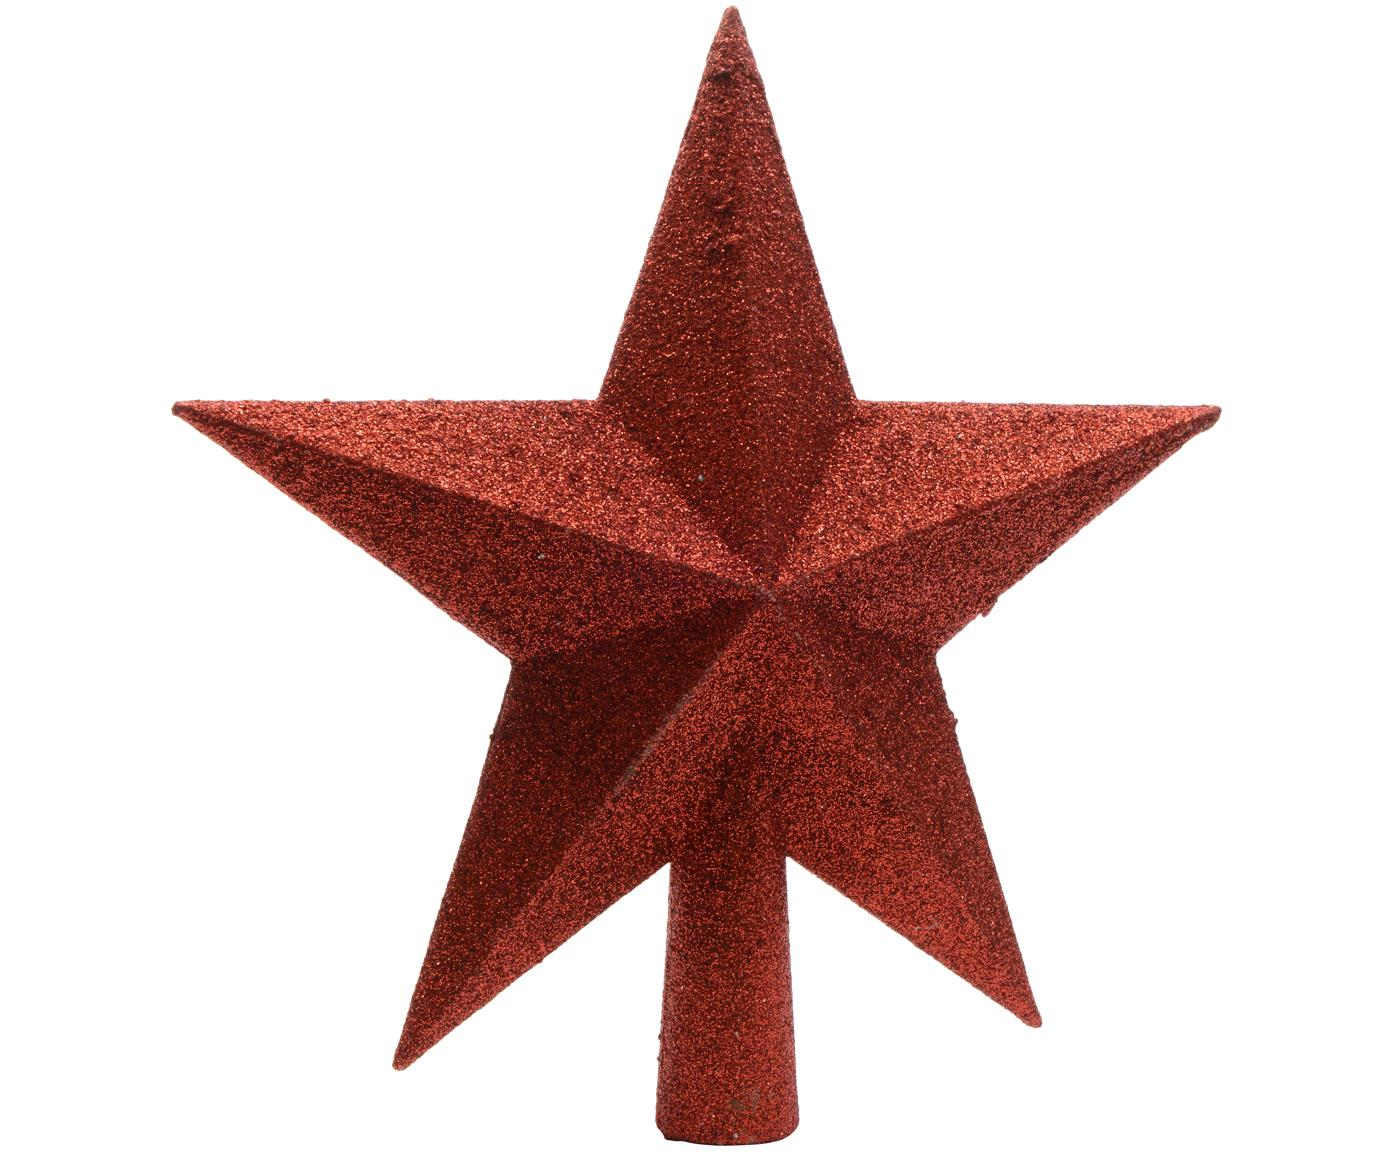 Piek Morning Star, Kunststof, Kerstrood, Ø 19 cm